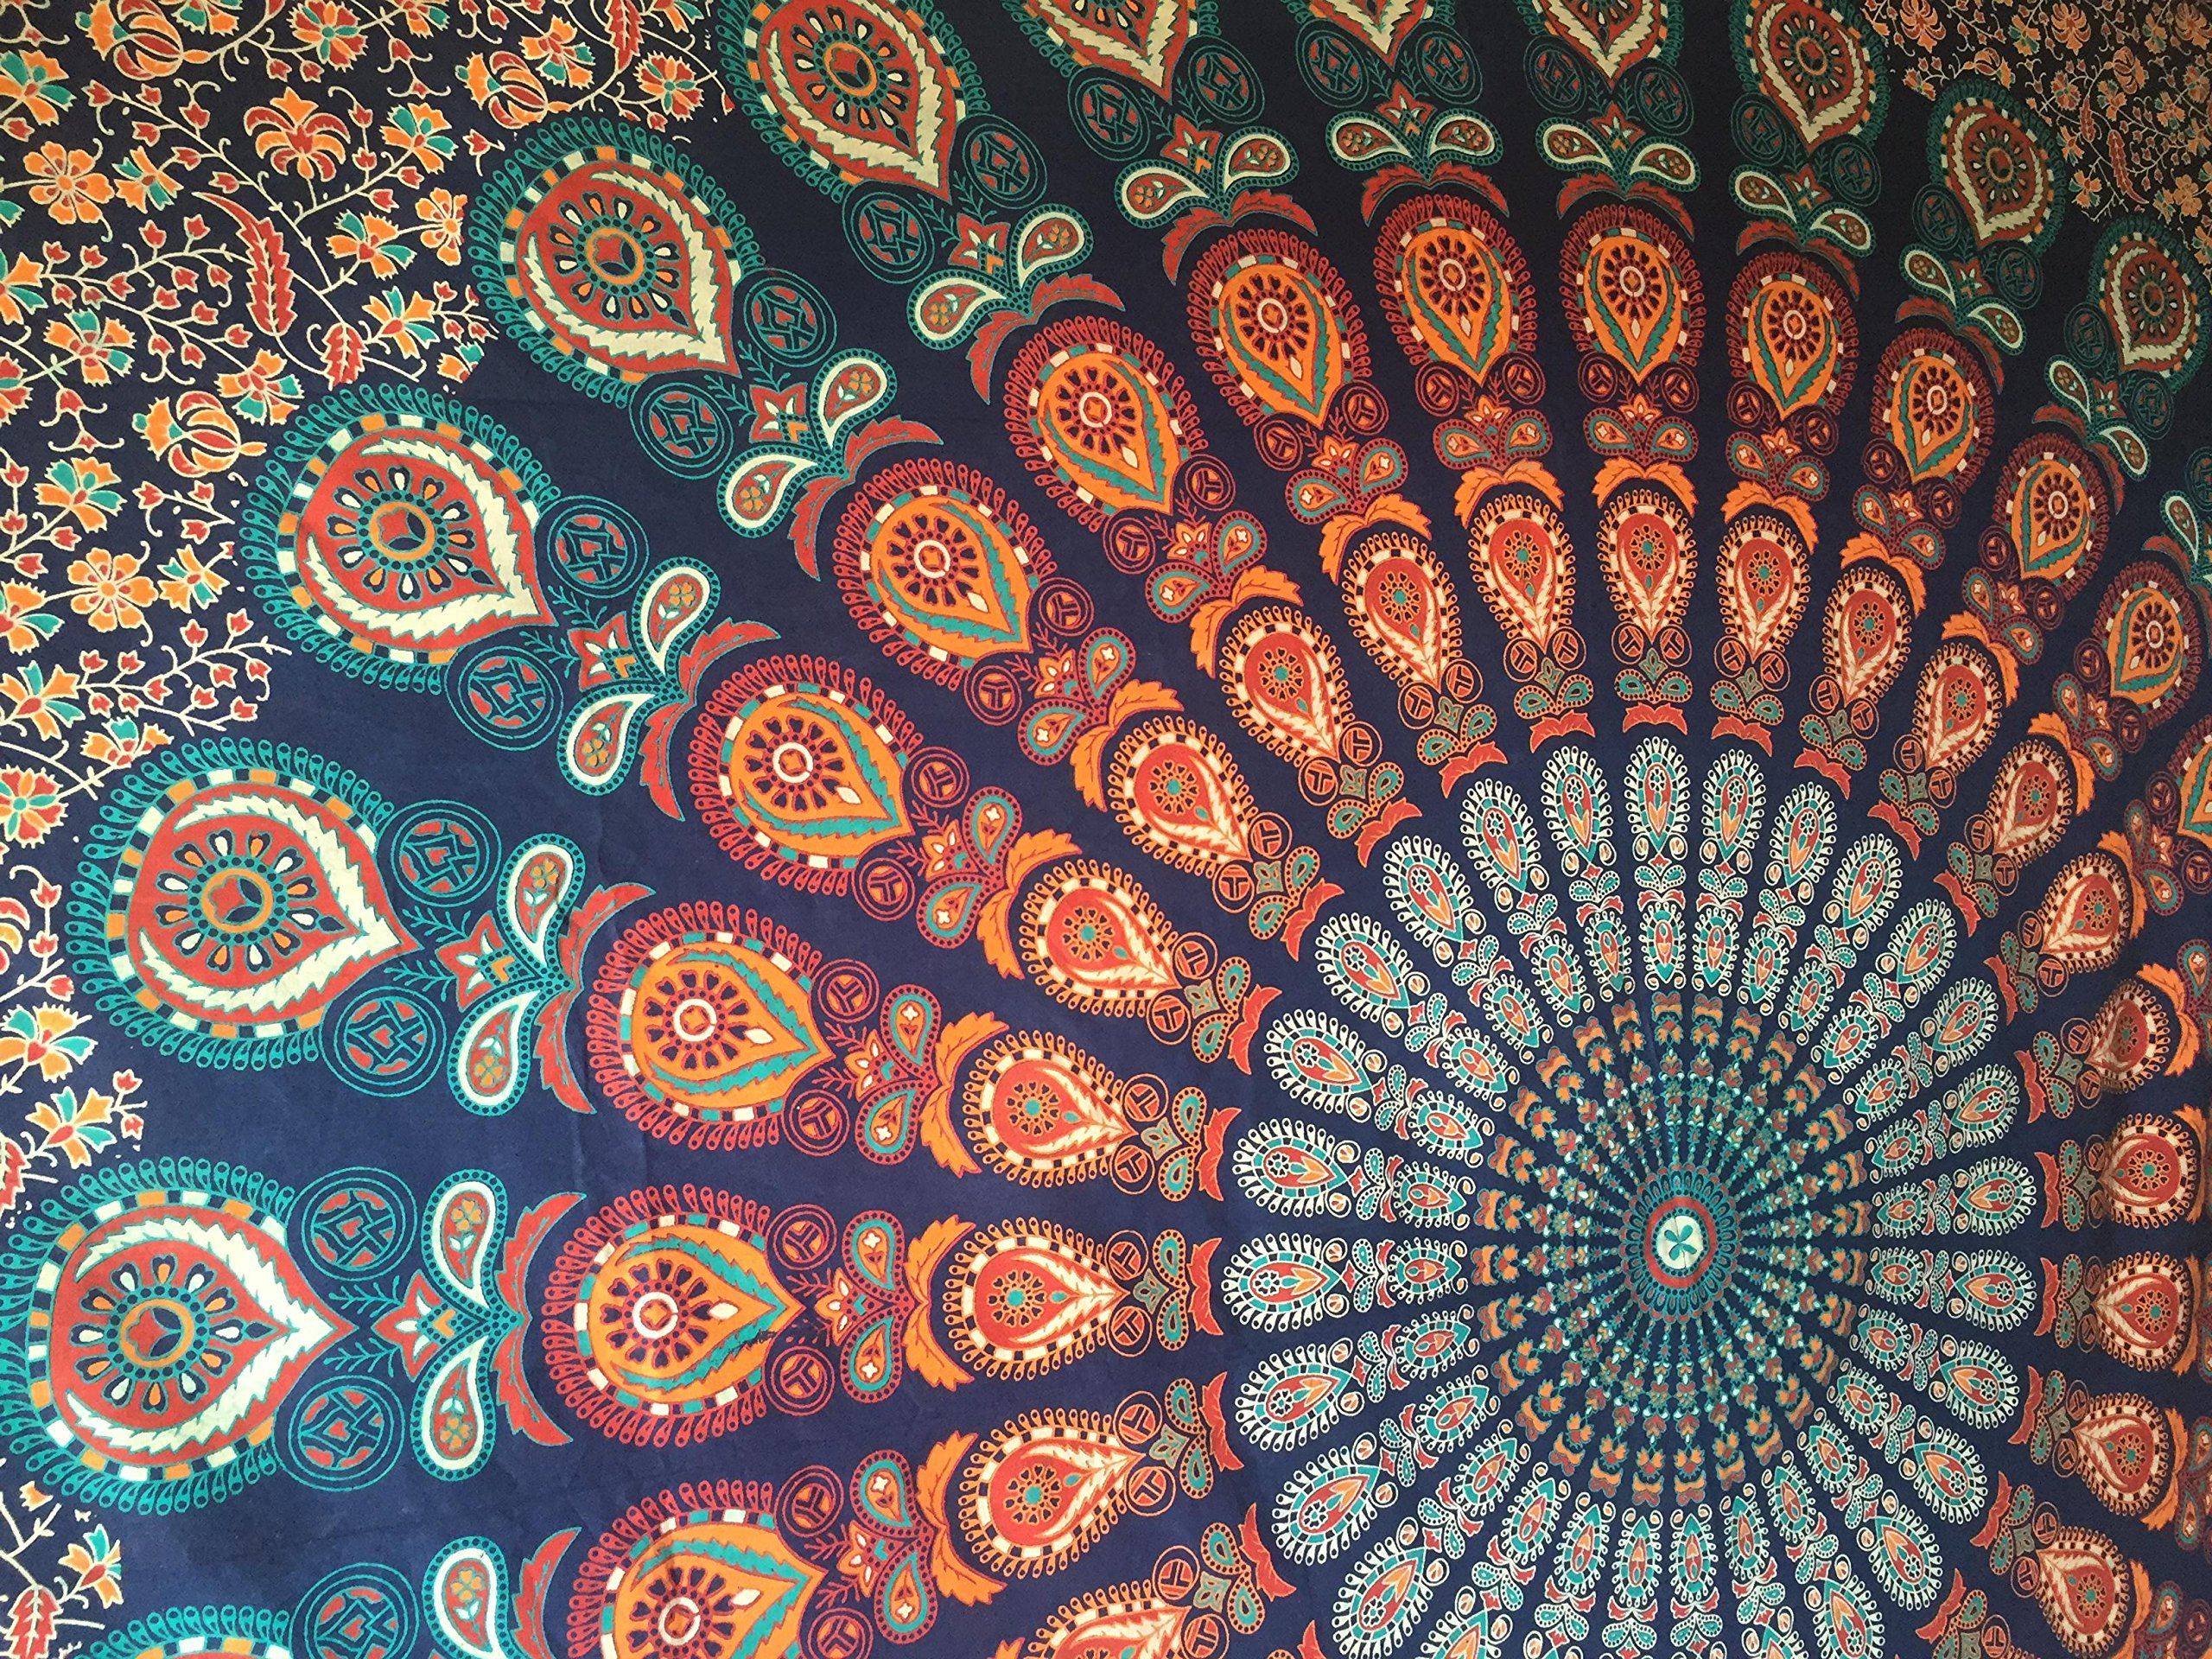 The Boho Street - Exclusive 100% Cotton Mandala Tapestry, Indian Mandala Wall Art, Hippie Wall Hanging, Bohemian Bedspread